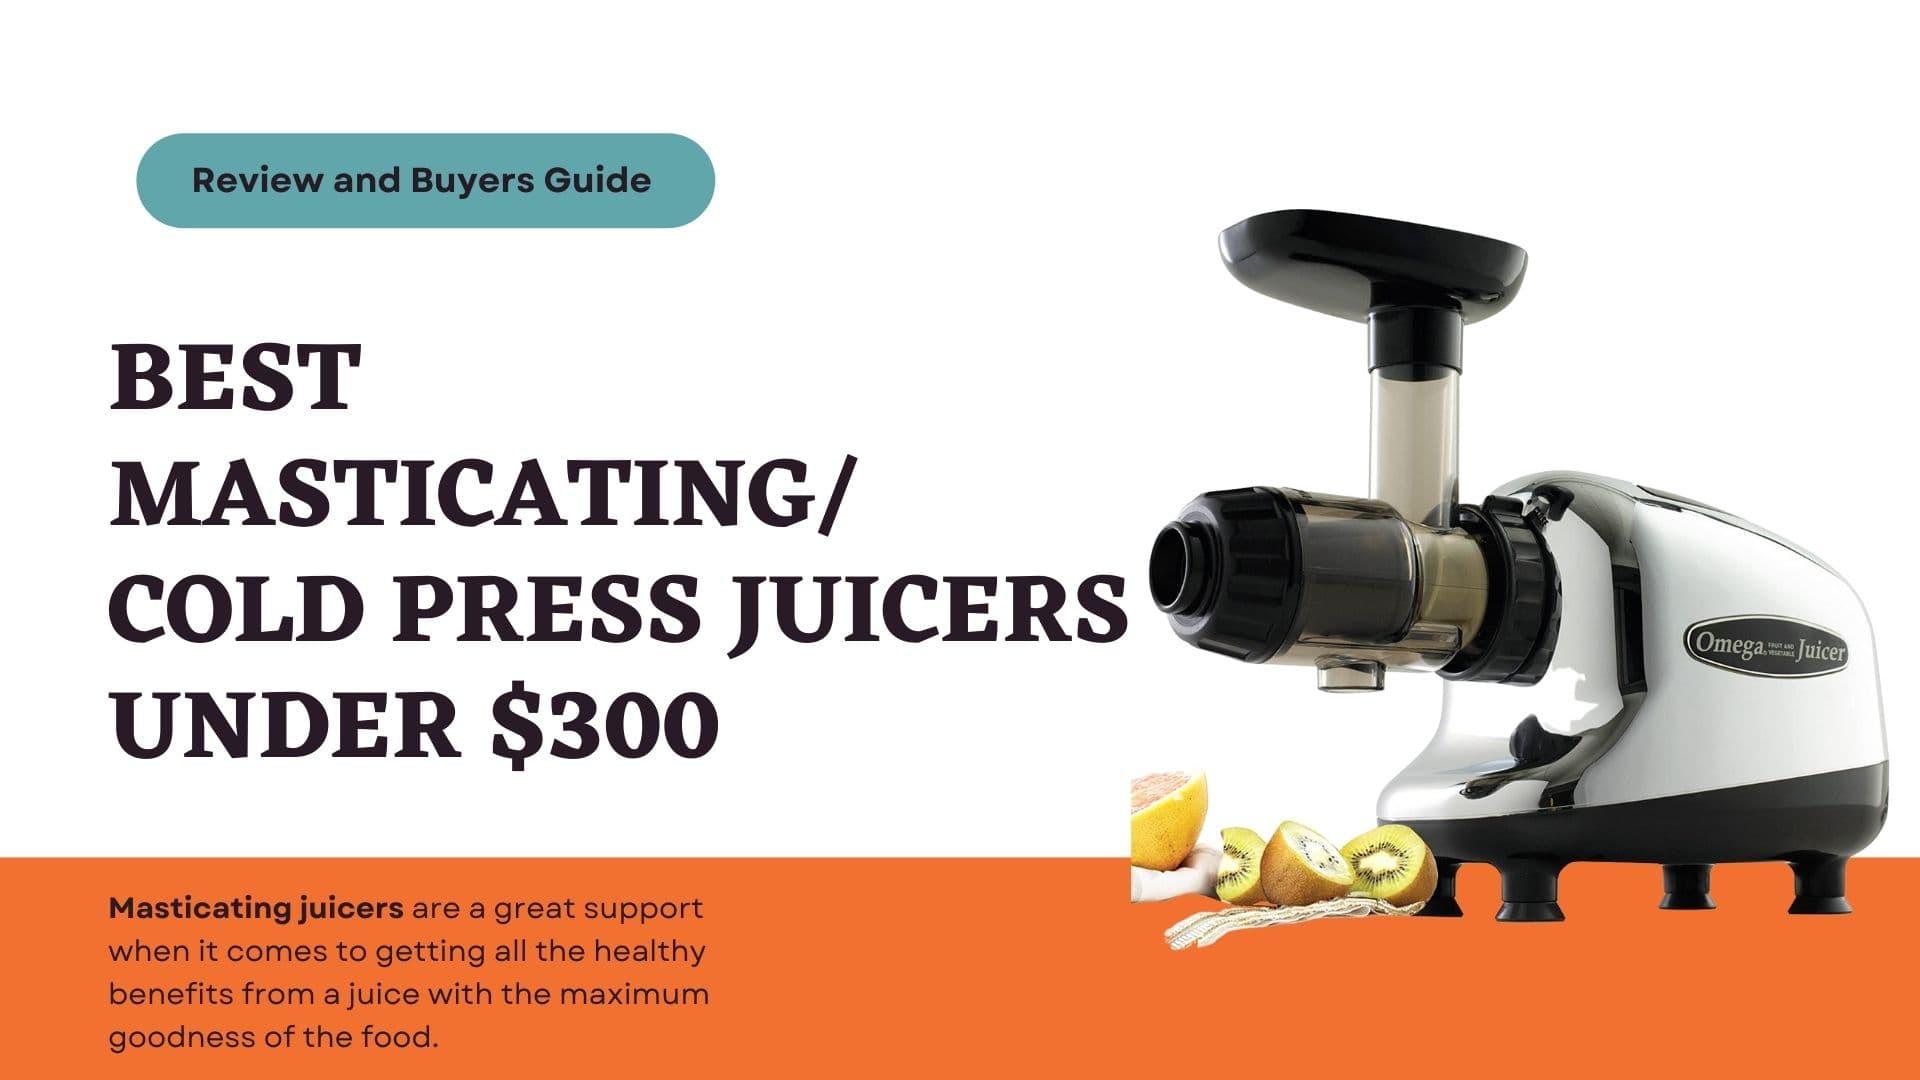 Best Masticating Cold Press Juicers Under 300